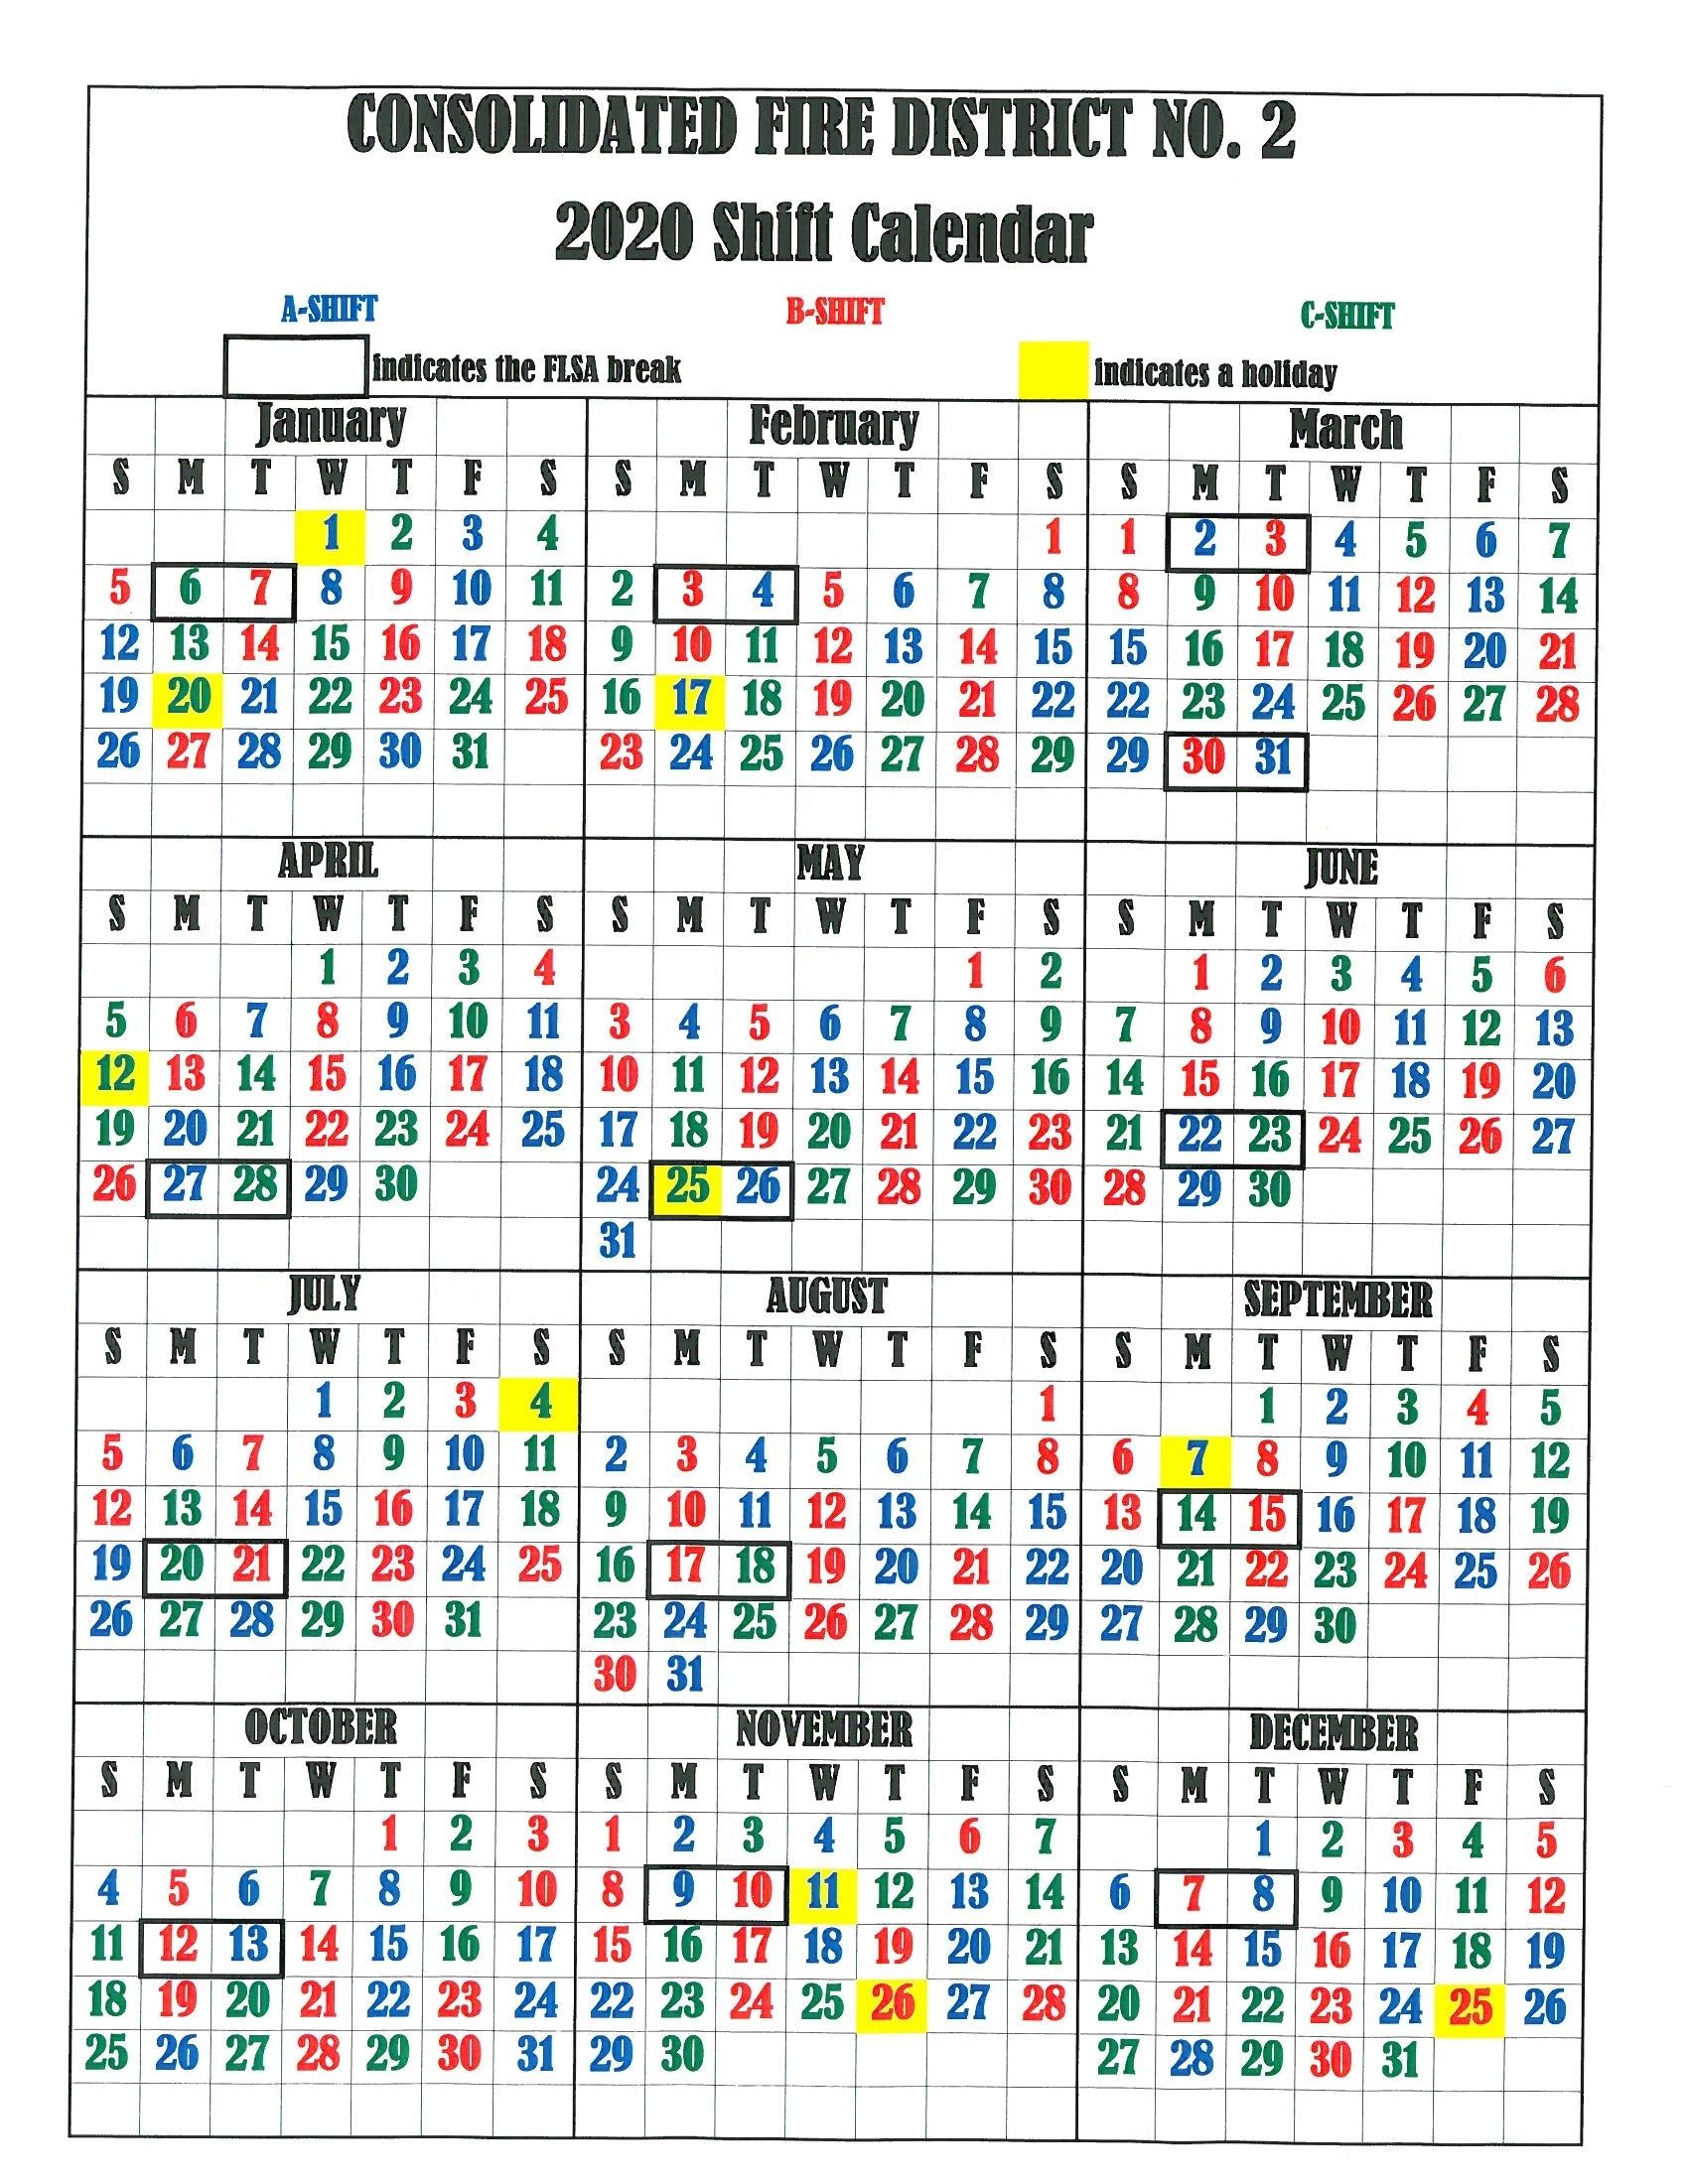 2020 Dupont Shift Schedule | Avnitasoni within Free Shift Calendar